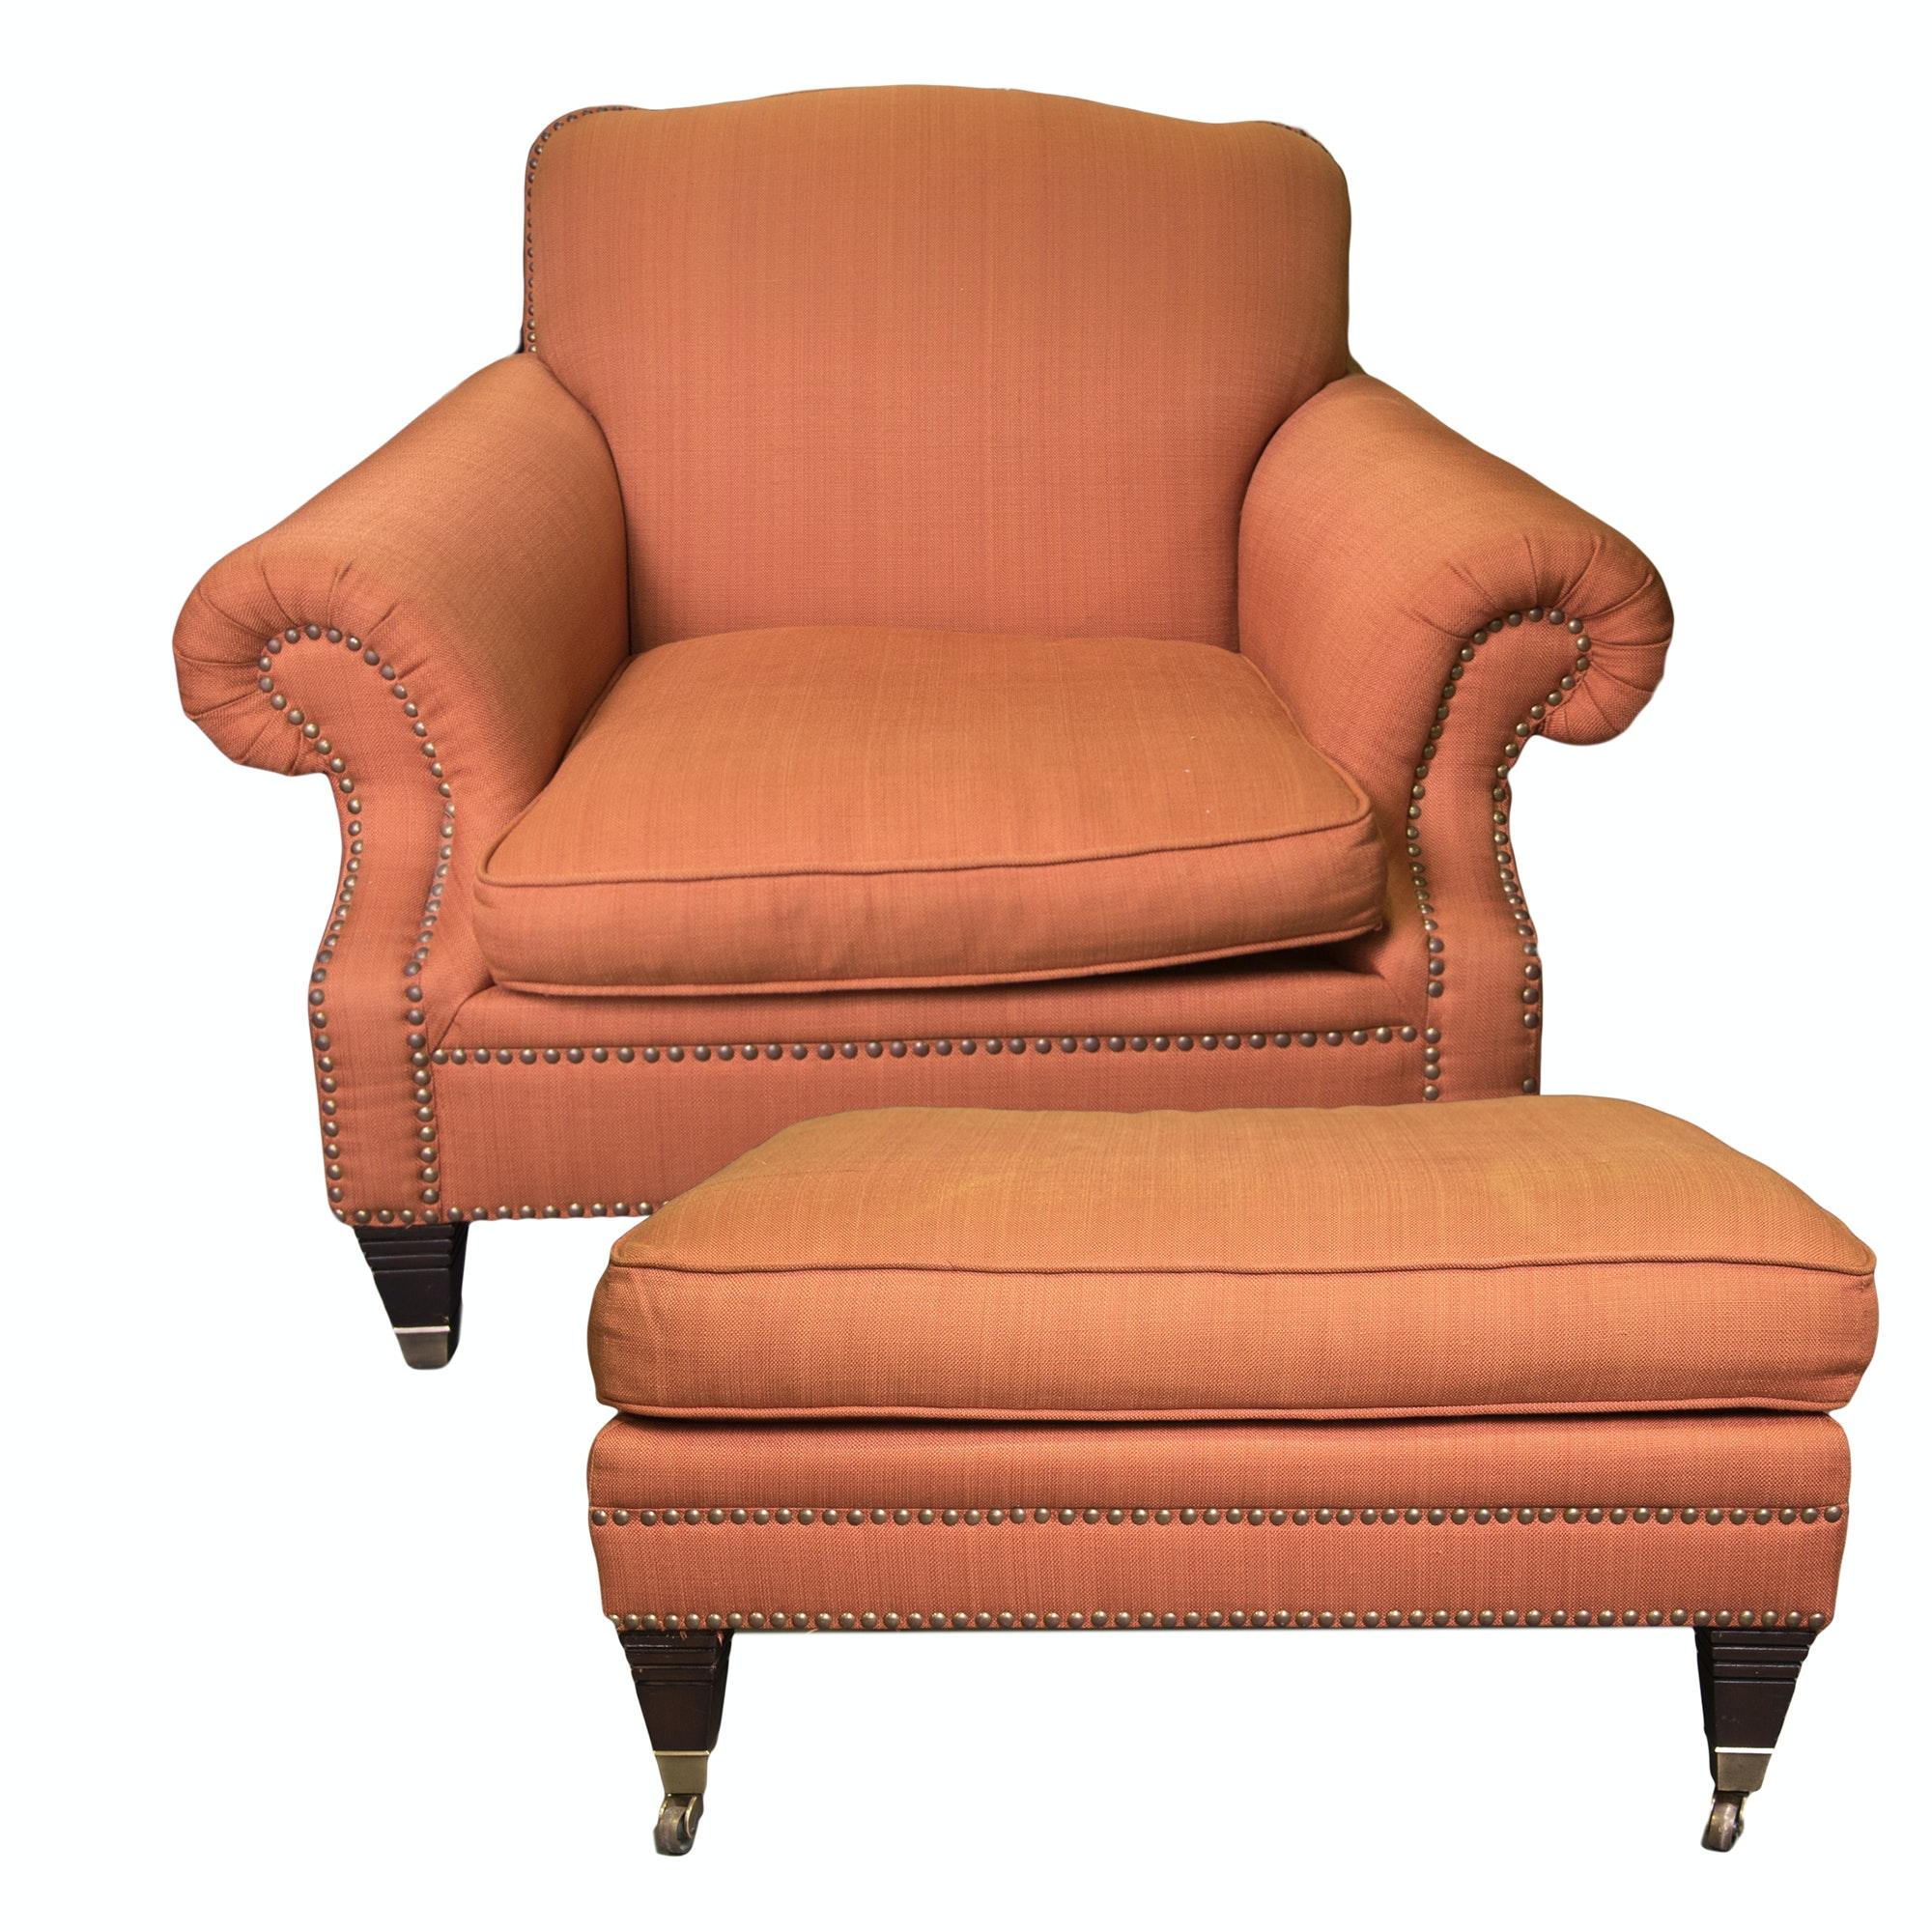 Burnt Orange Arm Chair and Ottoman